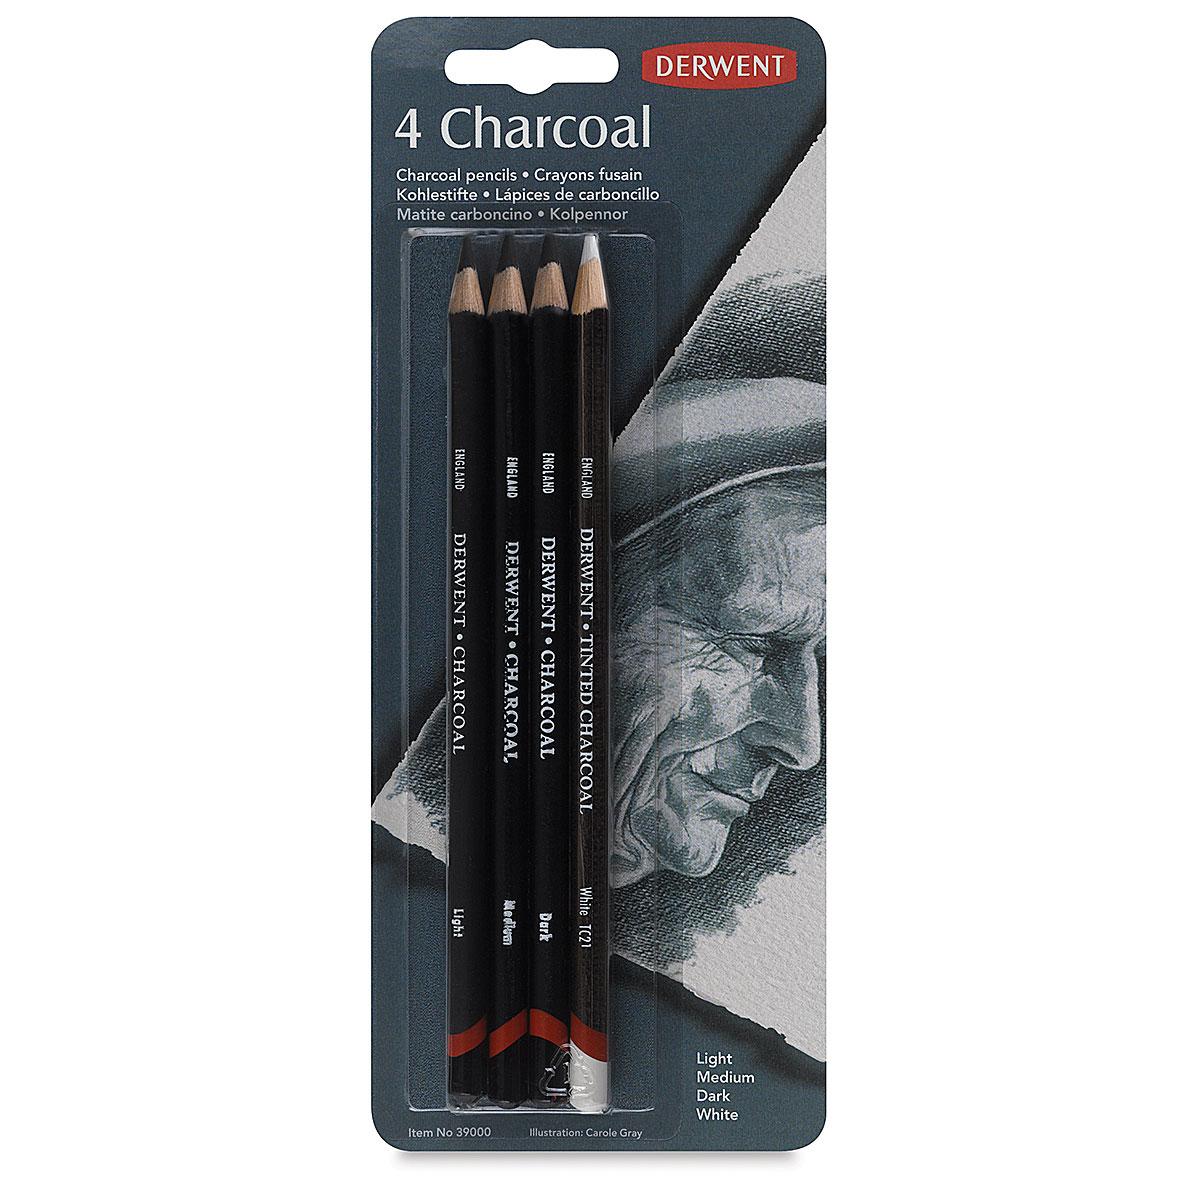 Sharpener Tin of 6 Pencils DERWENT Charcoal Pencil Set